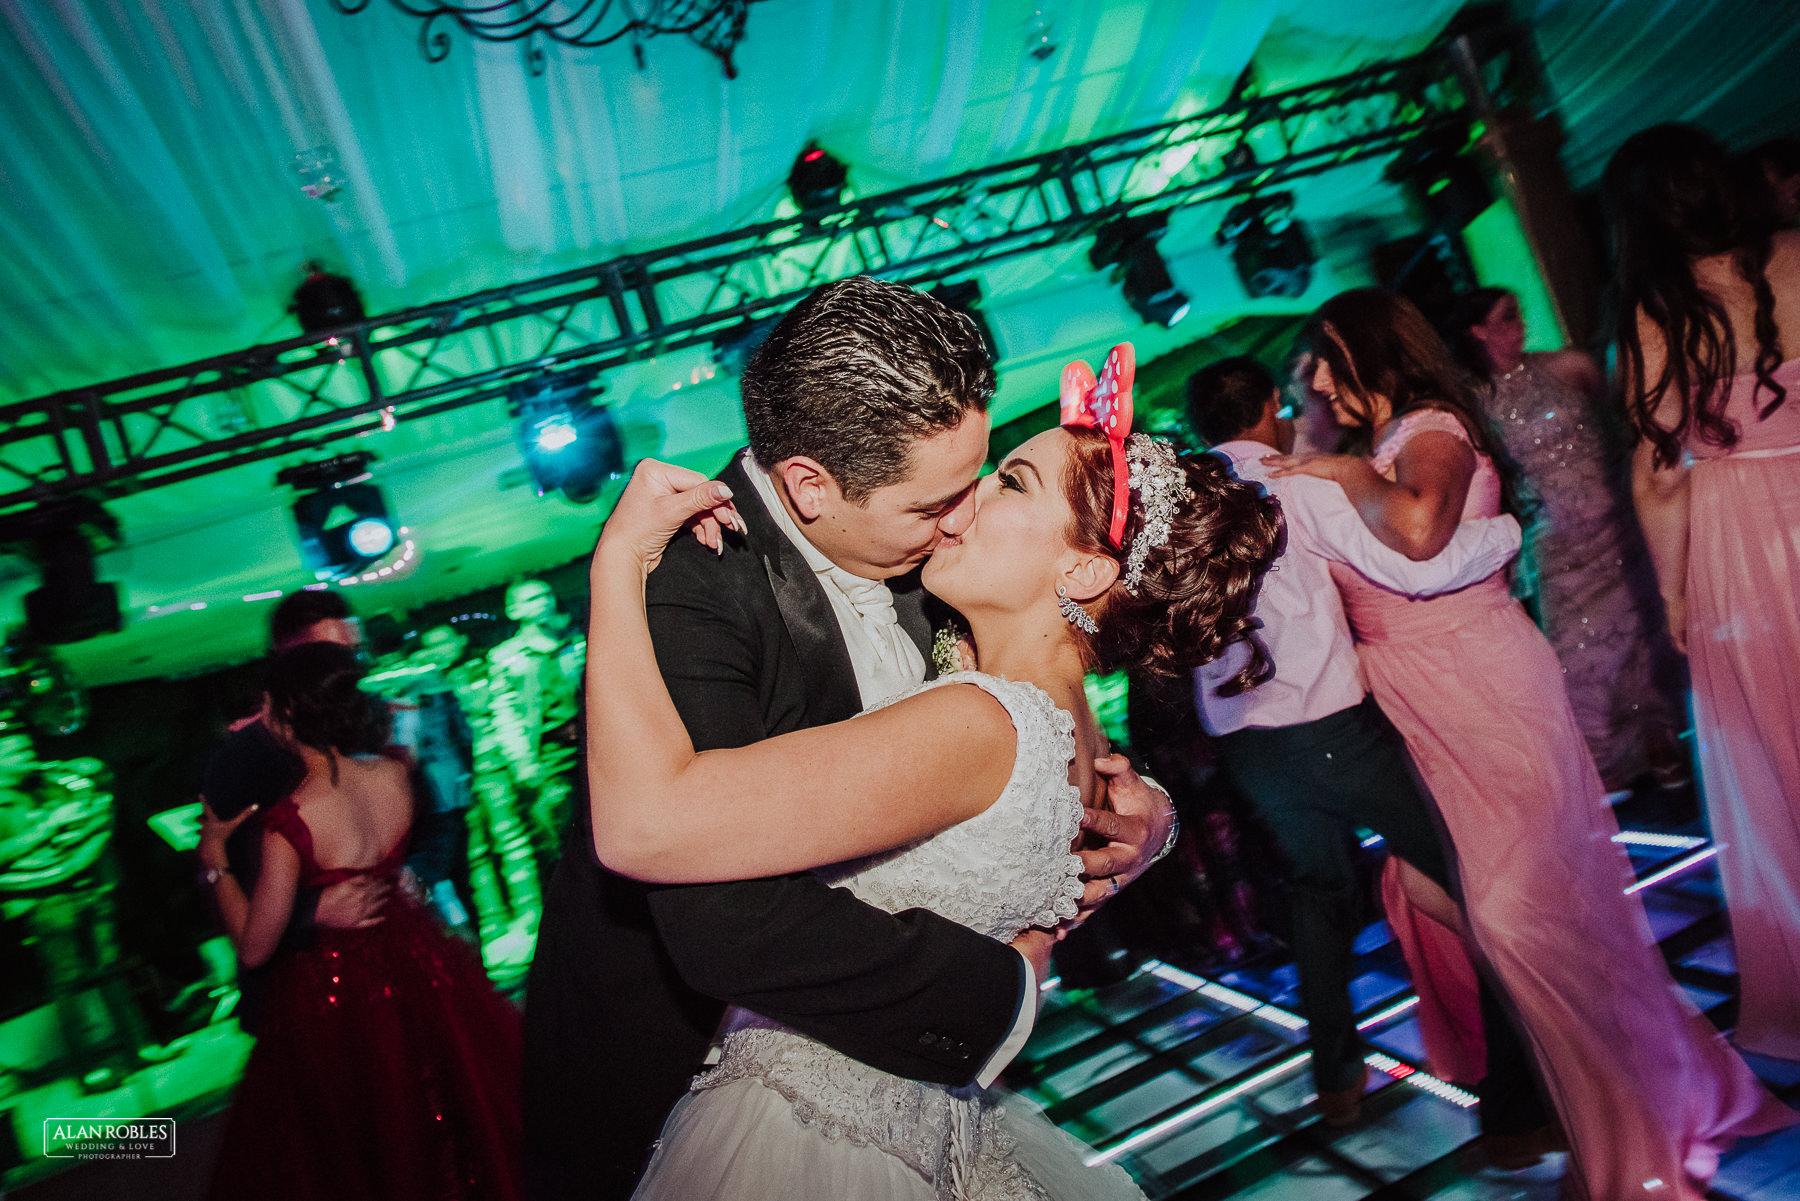 Alan Robles fotografo de bodas guadalajara - LyP Hotel Demetria-79